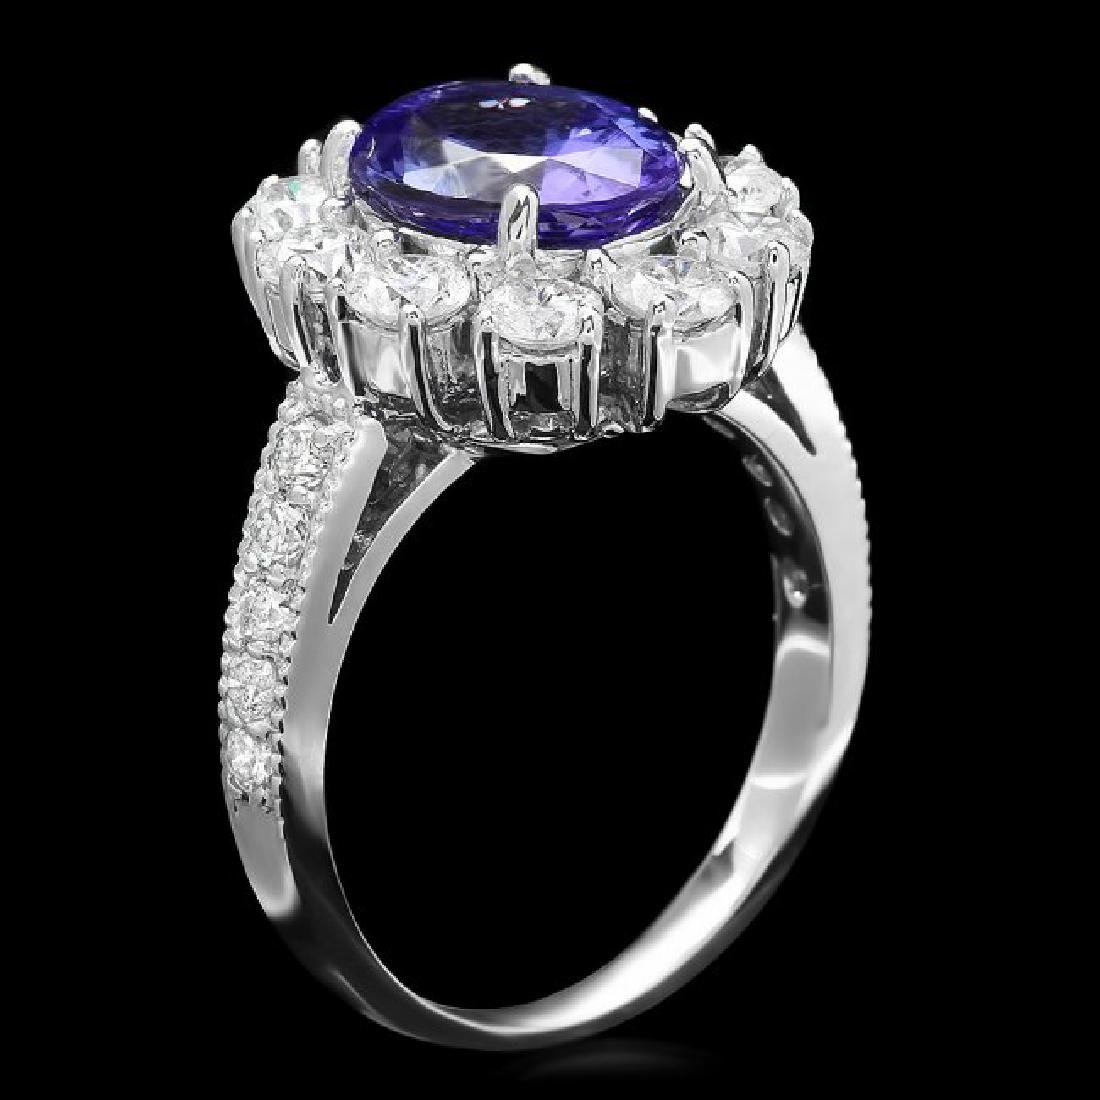 14k Gold 2.60ct Tanzanite 1.60ct Diamond Ring - 2